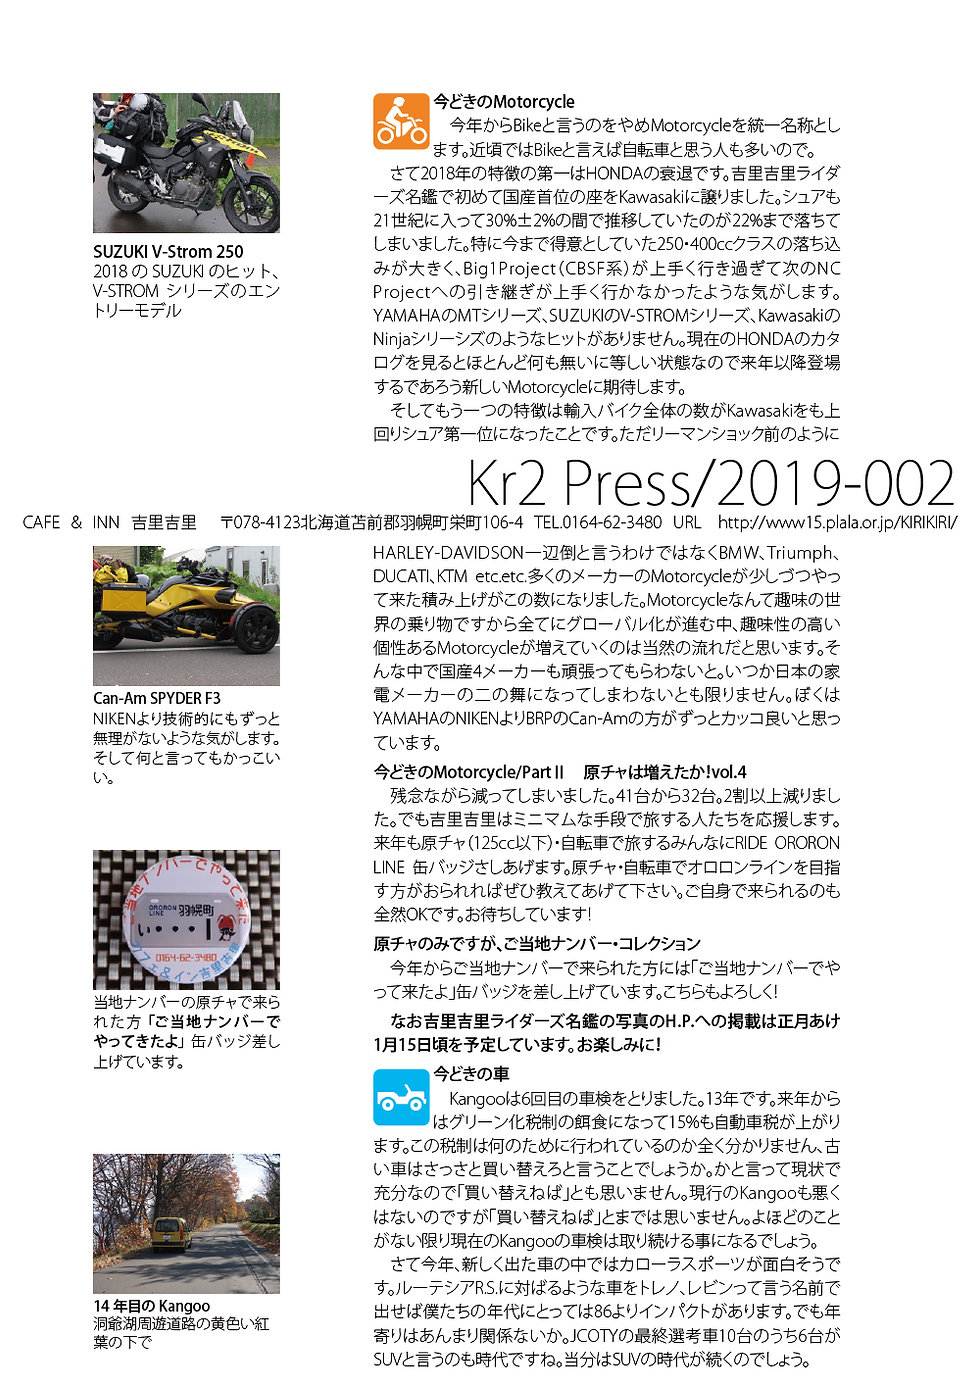 2019Kr2Press02.jpg